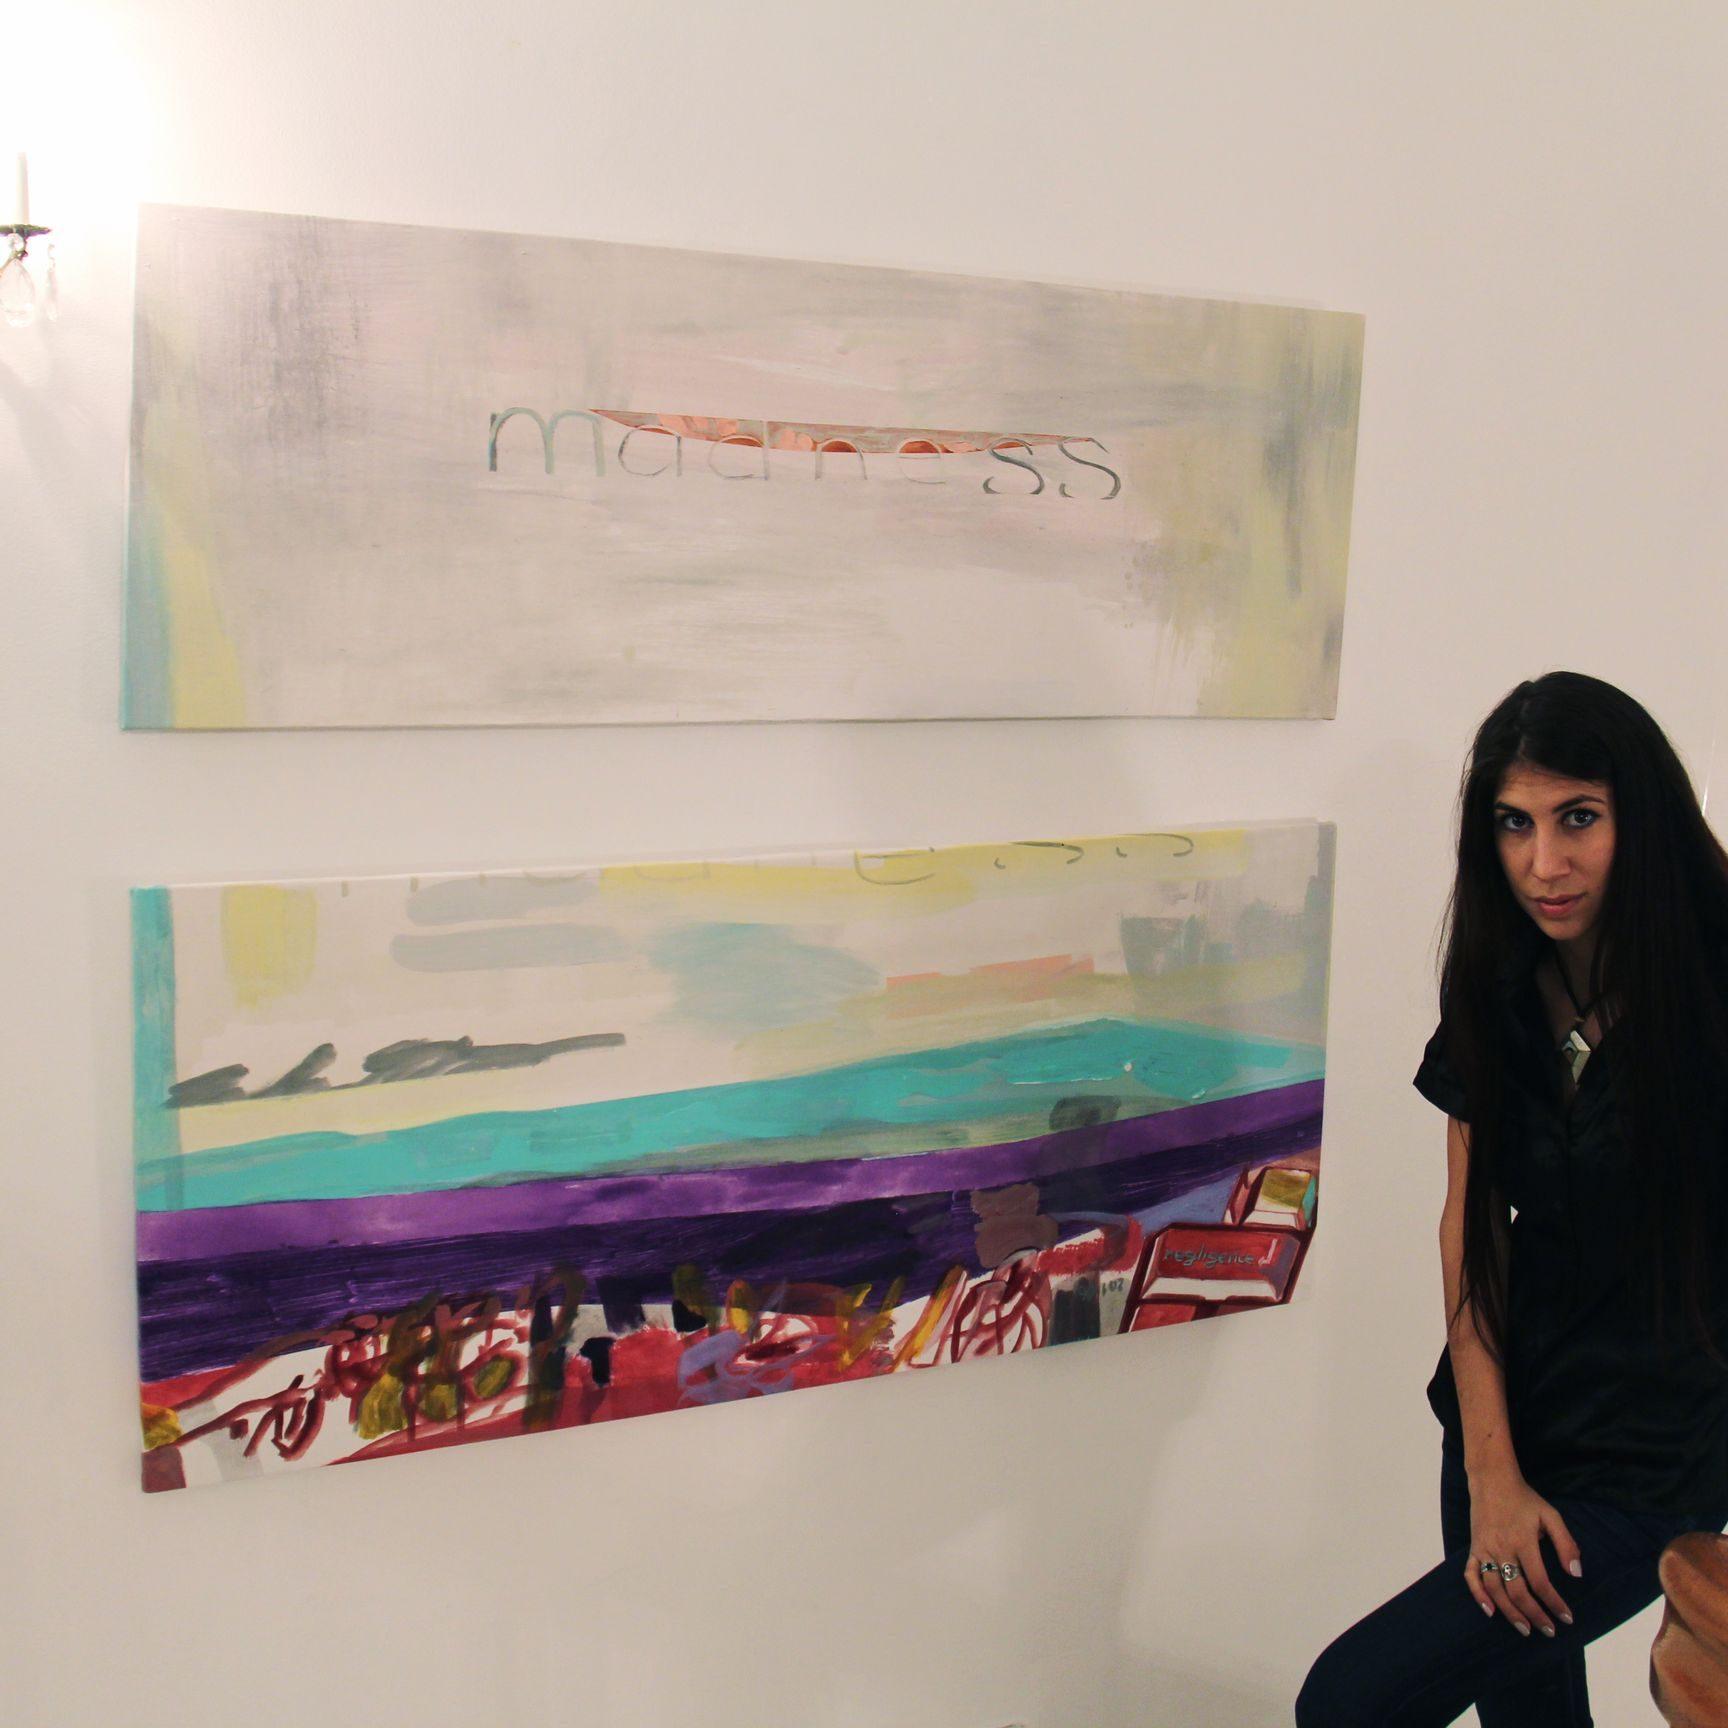 November exhibition 2016 by Ioana Niculescu Aron